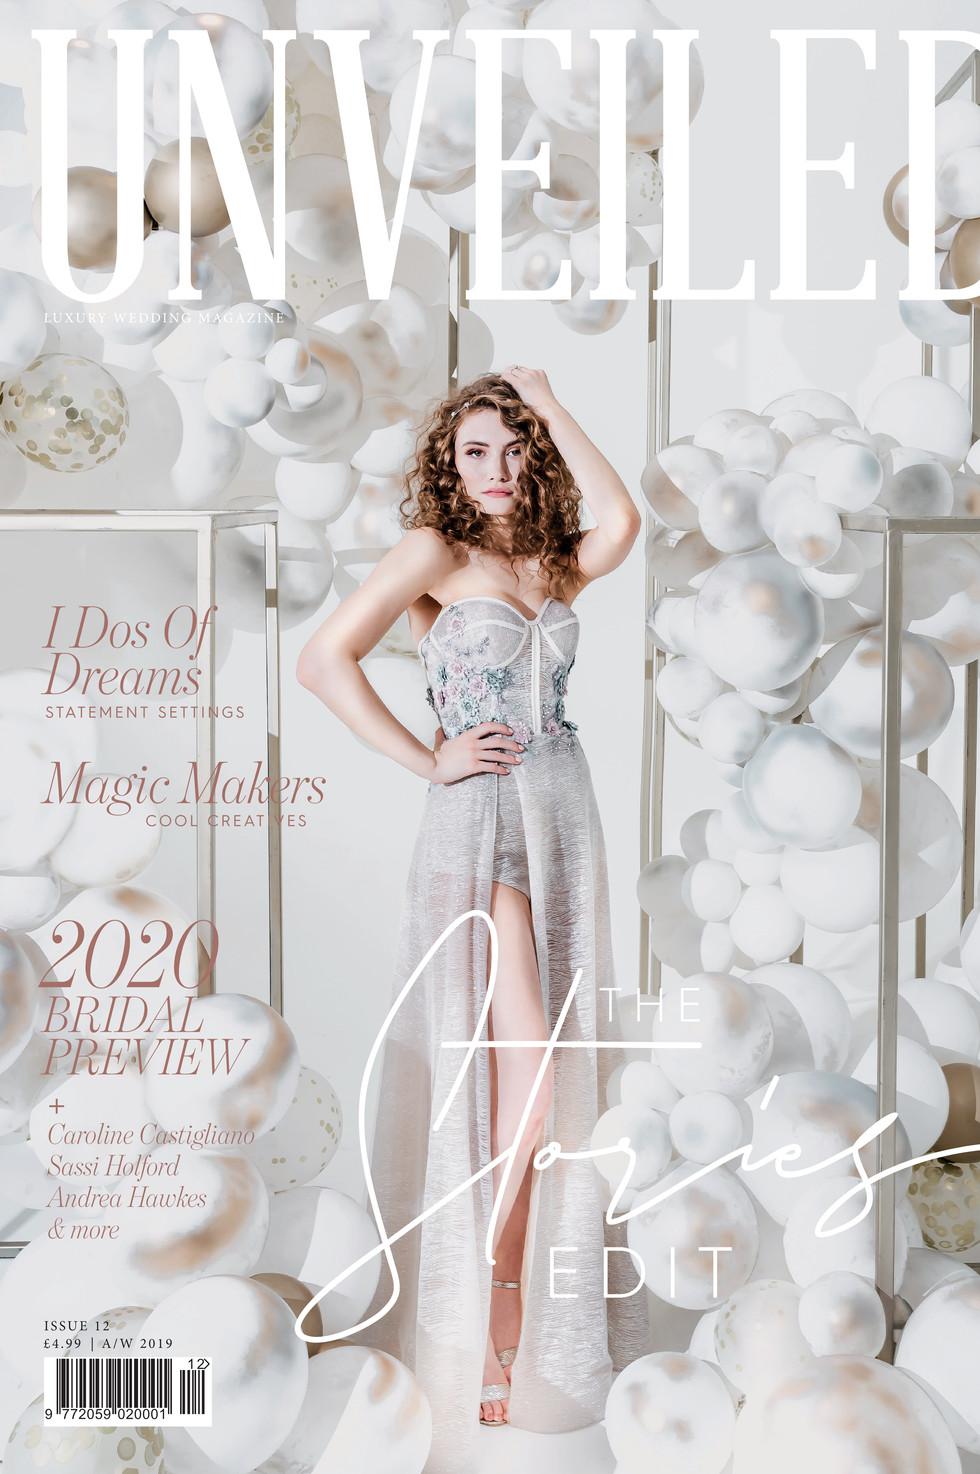 Unveiled magazine